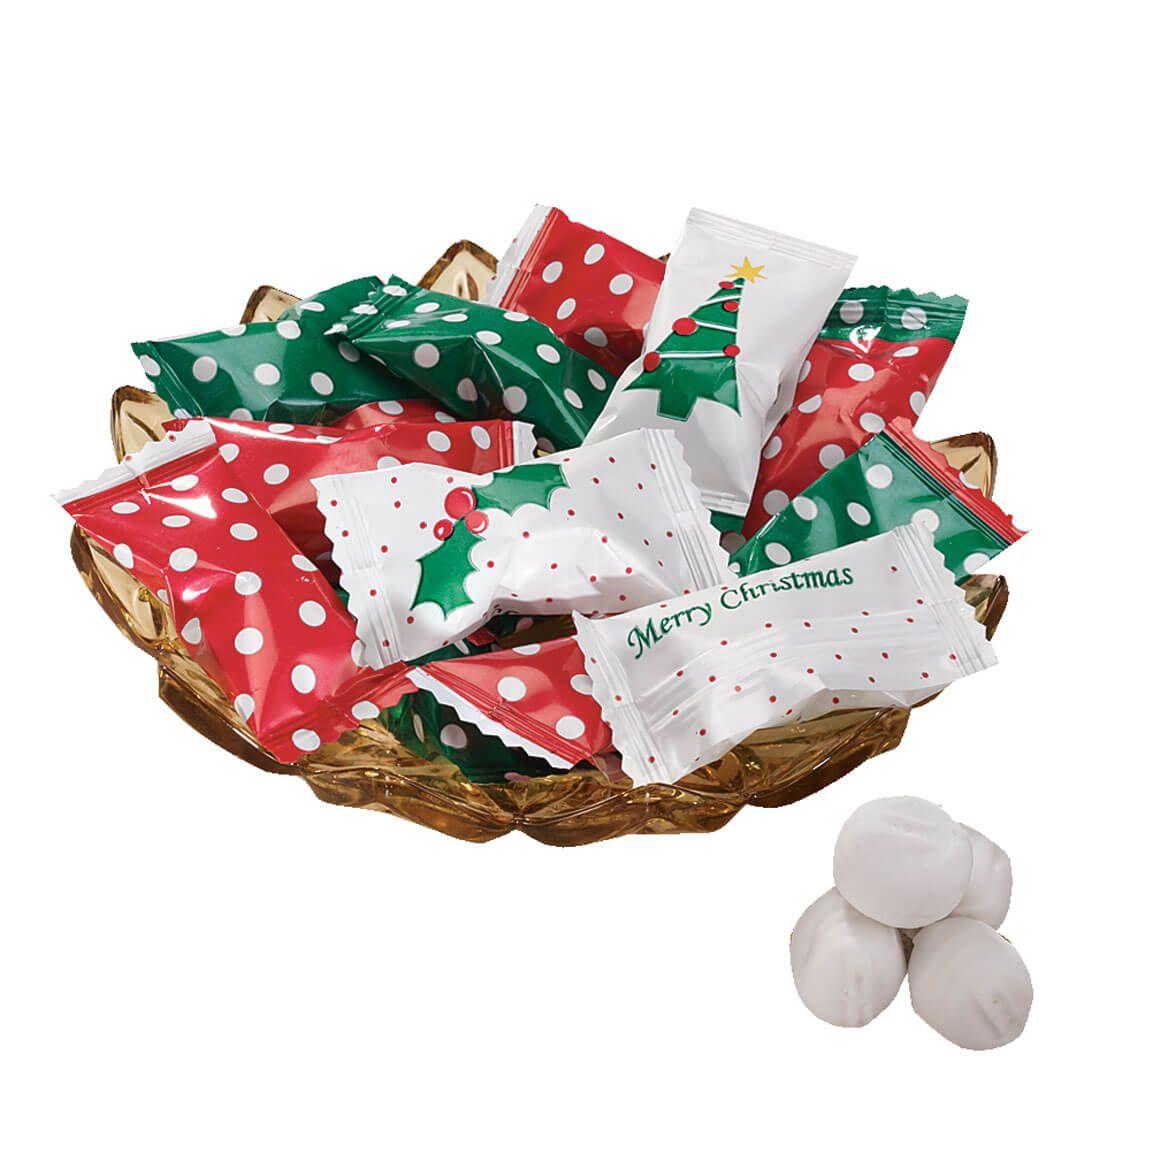 Christmas Buttermint Creams 7 oz.-317714